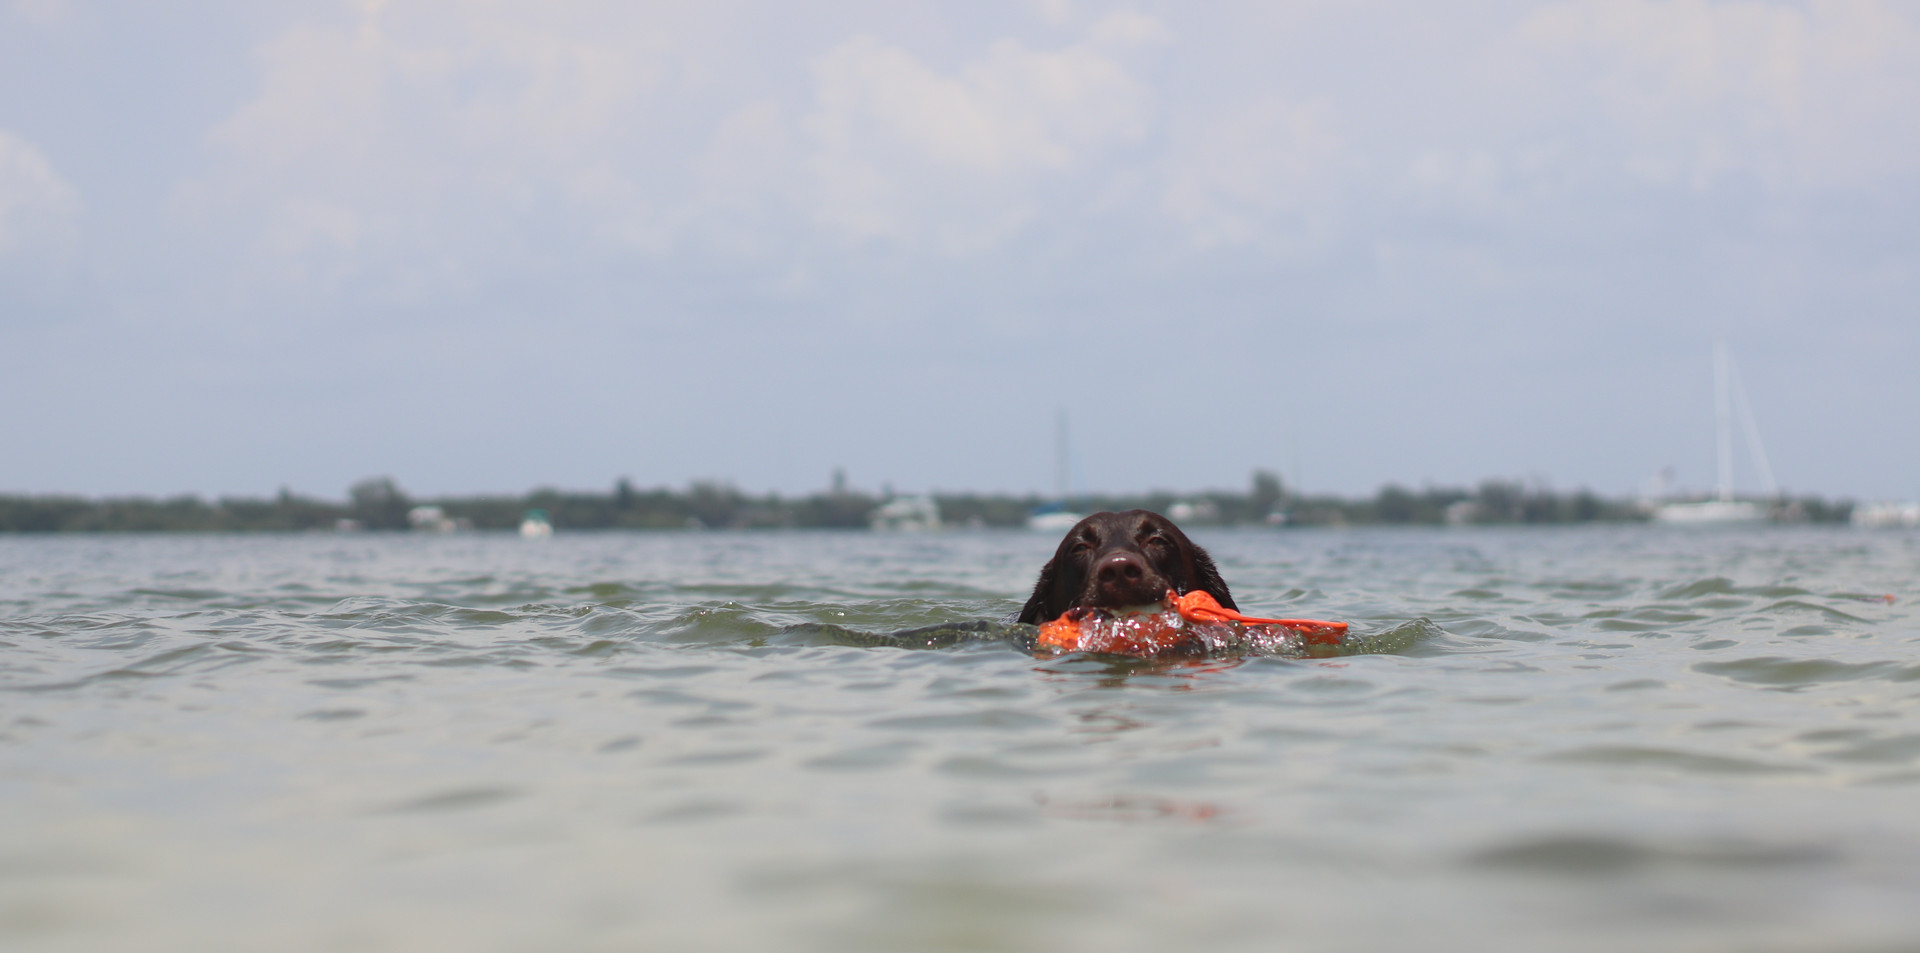 Drex swimming.JPG